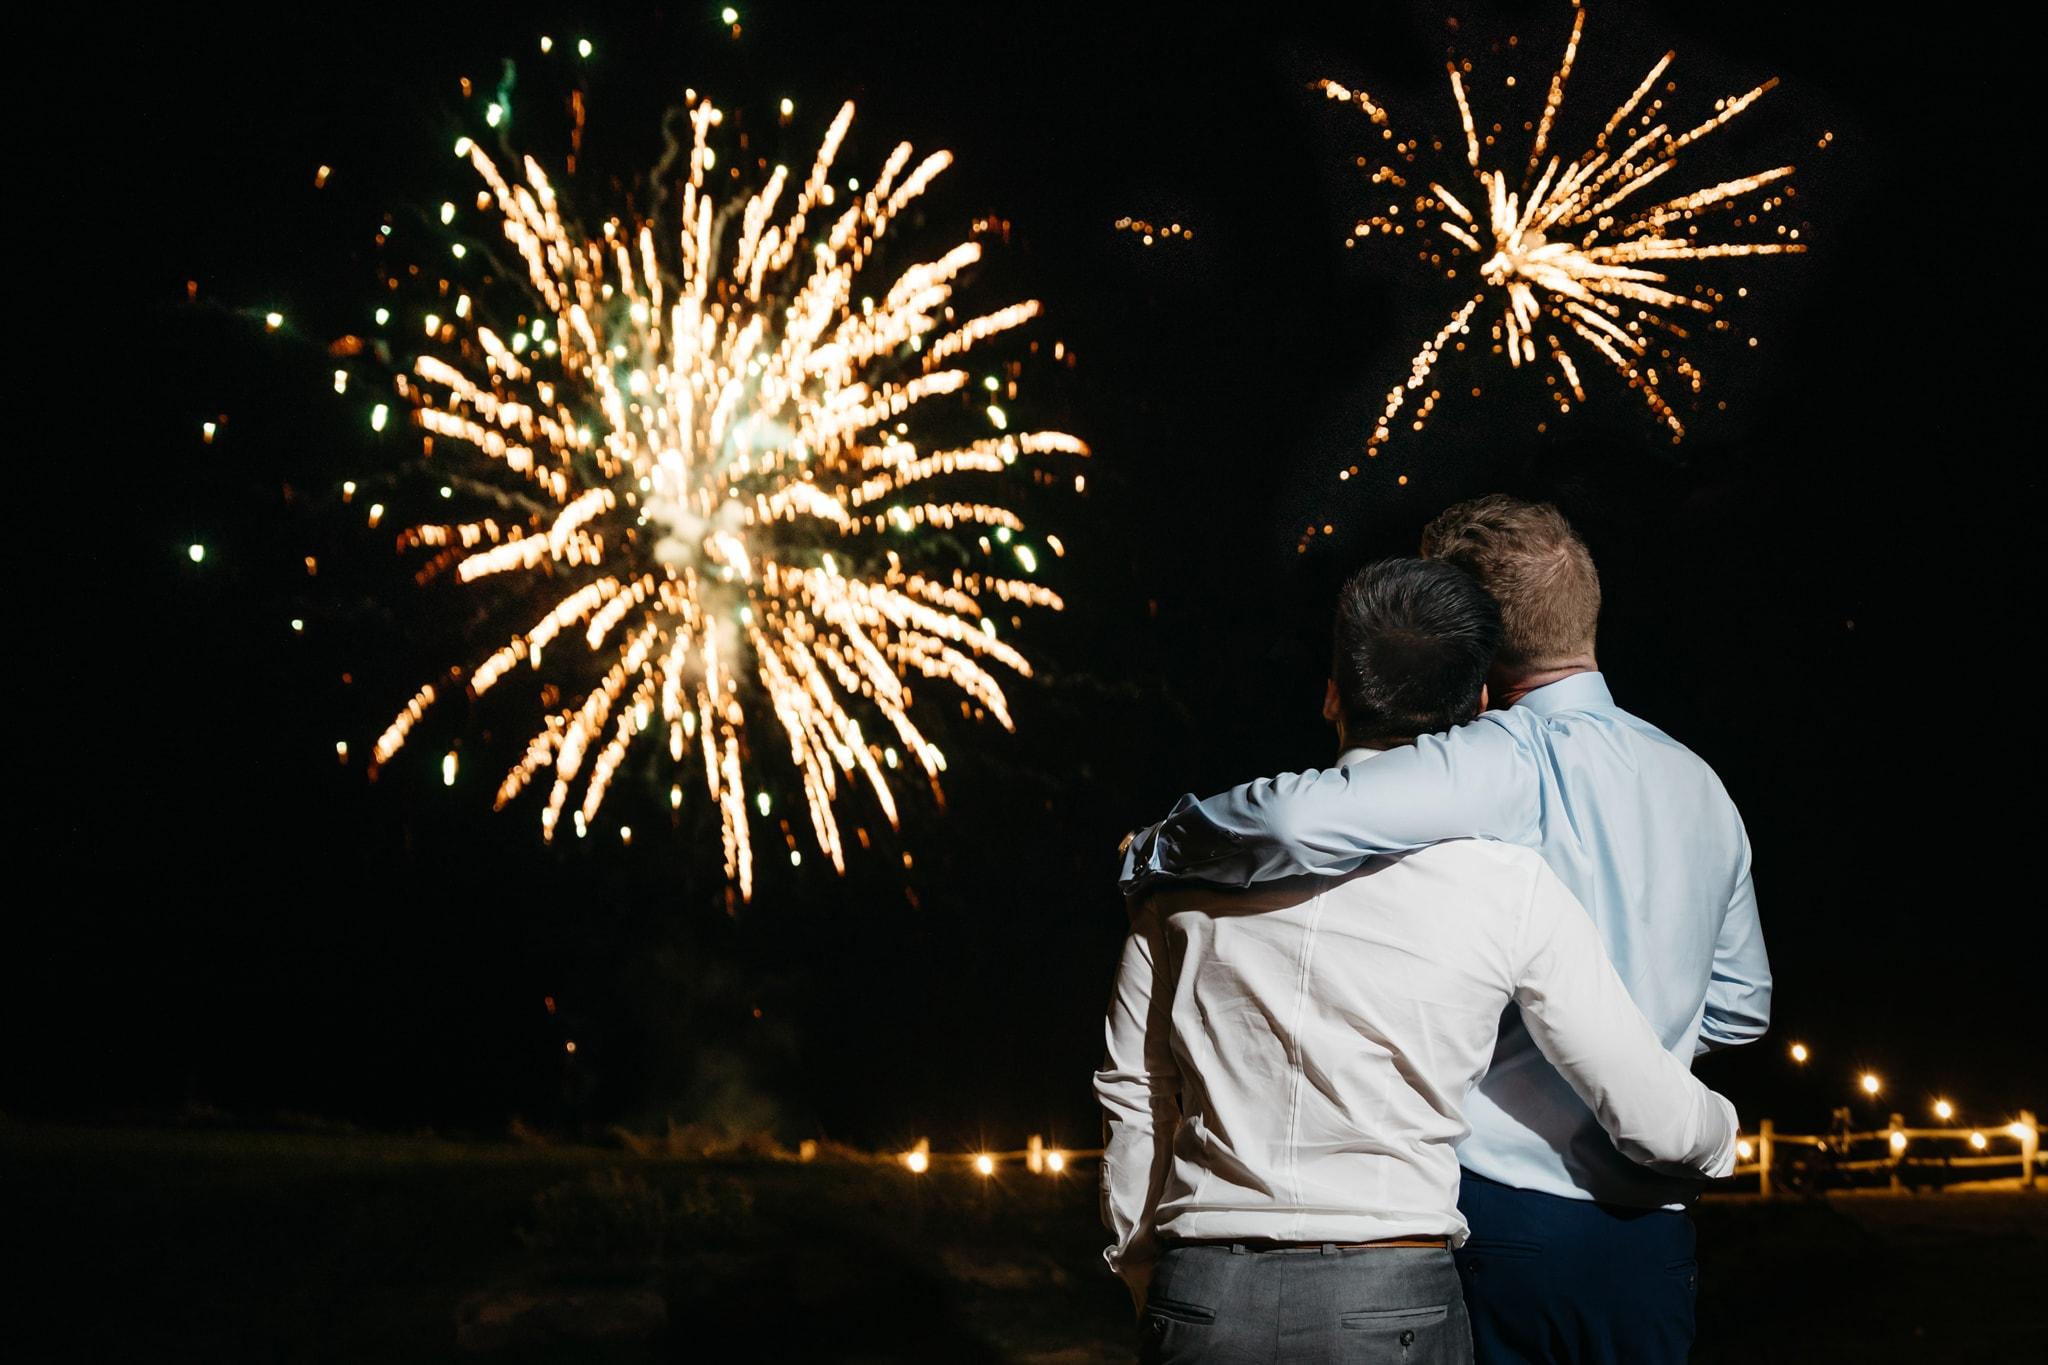 Same sex couple with wedding fireworks